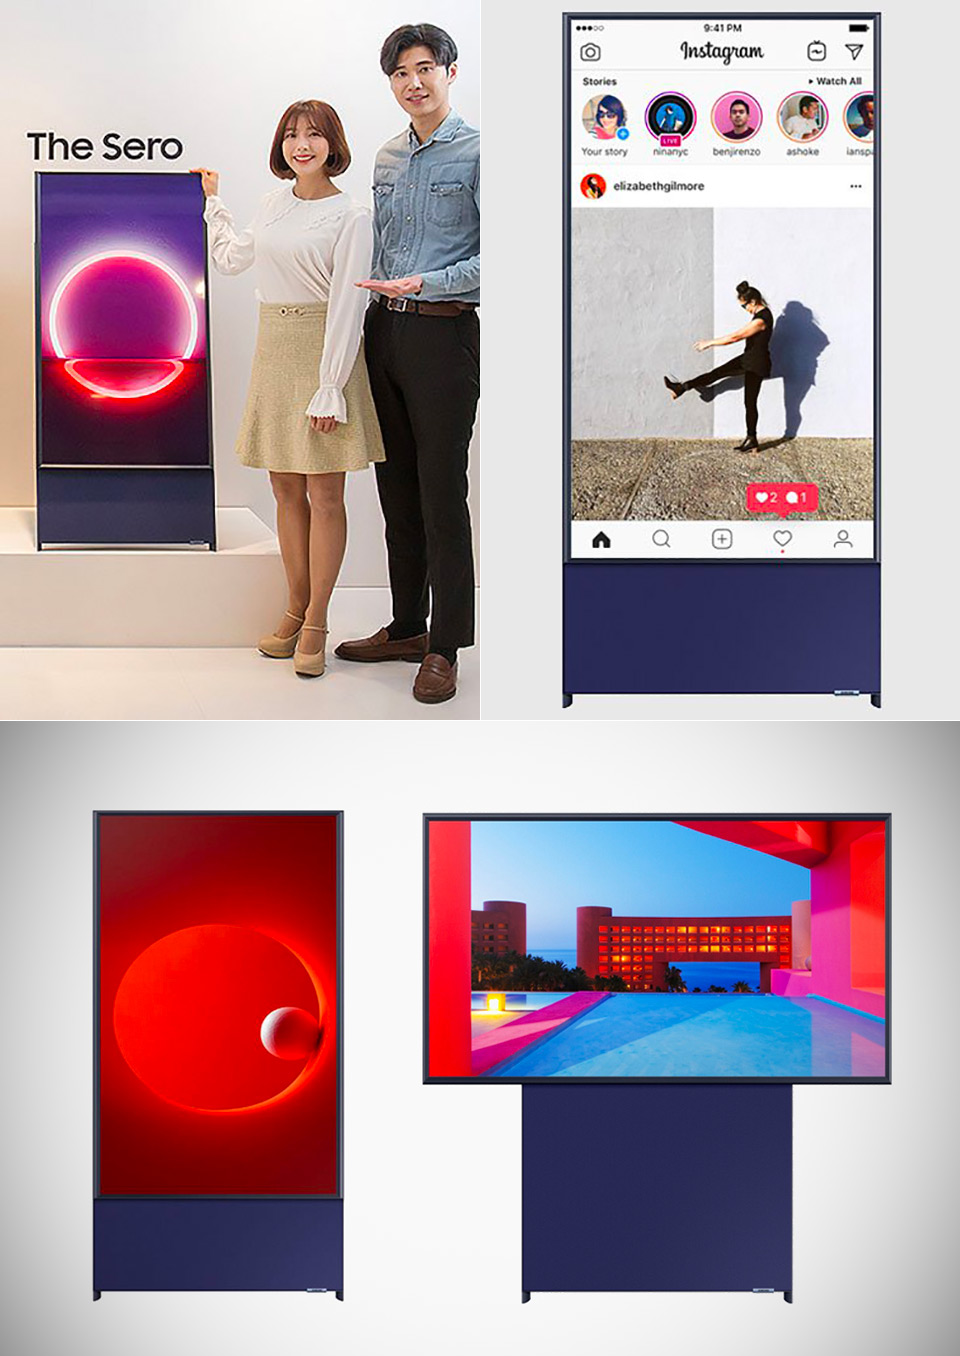 Samsung Sero Vertical TV